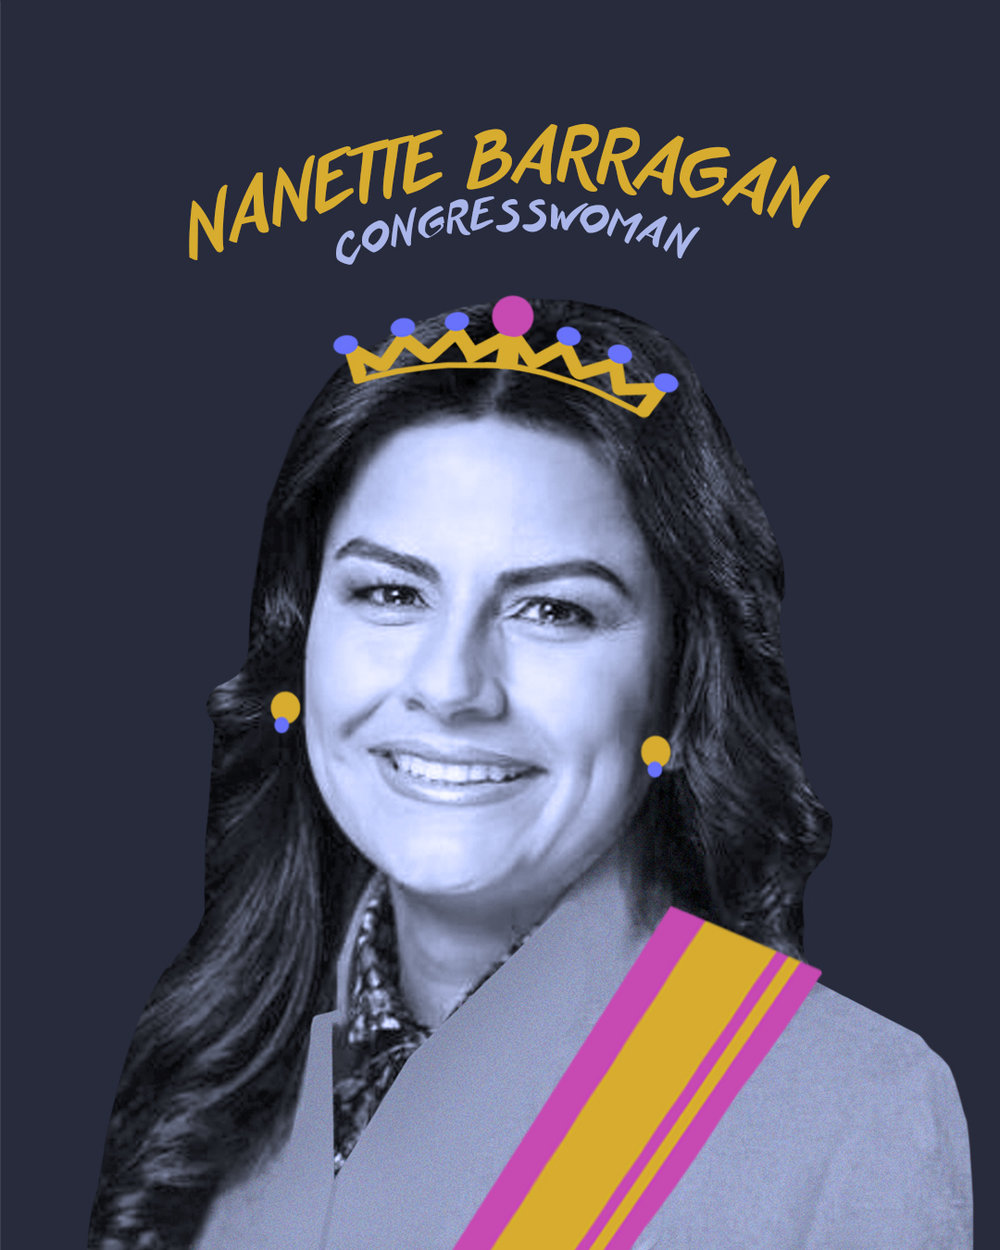 Nanette_Barragan.jpg